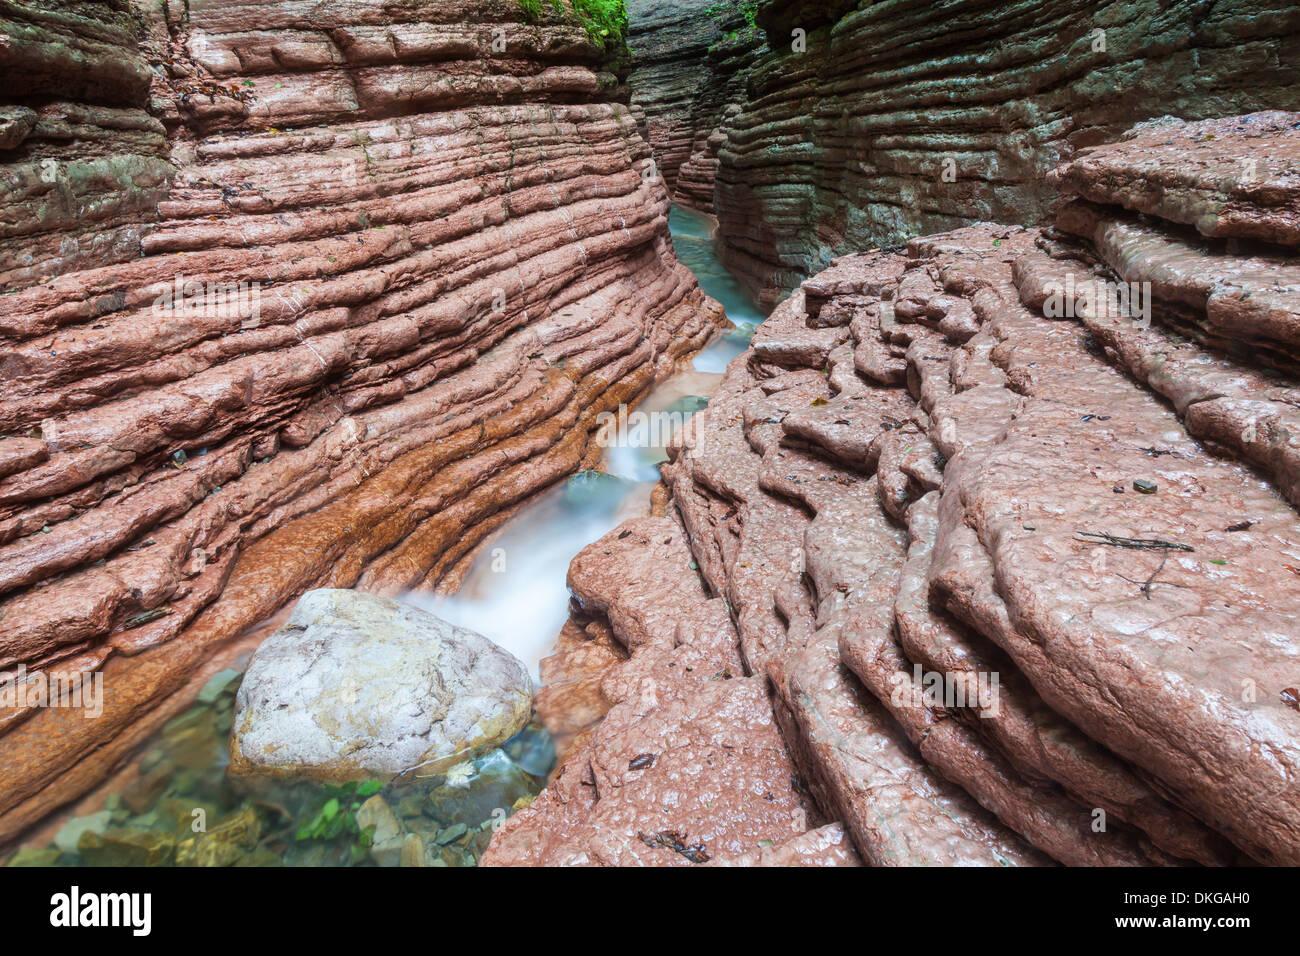 Taugl gorge in Tennengau, Salzburg State, Austria Stock Photo